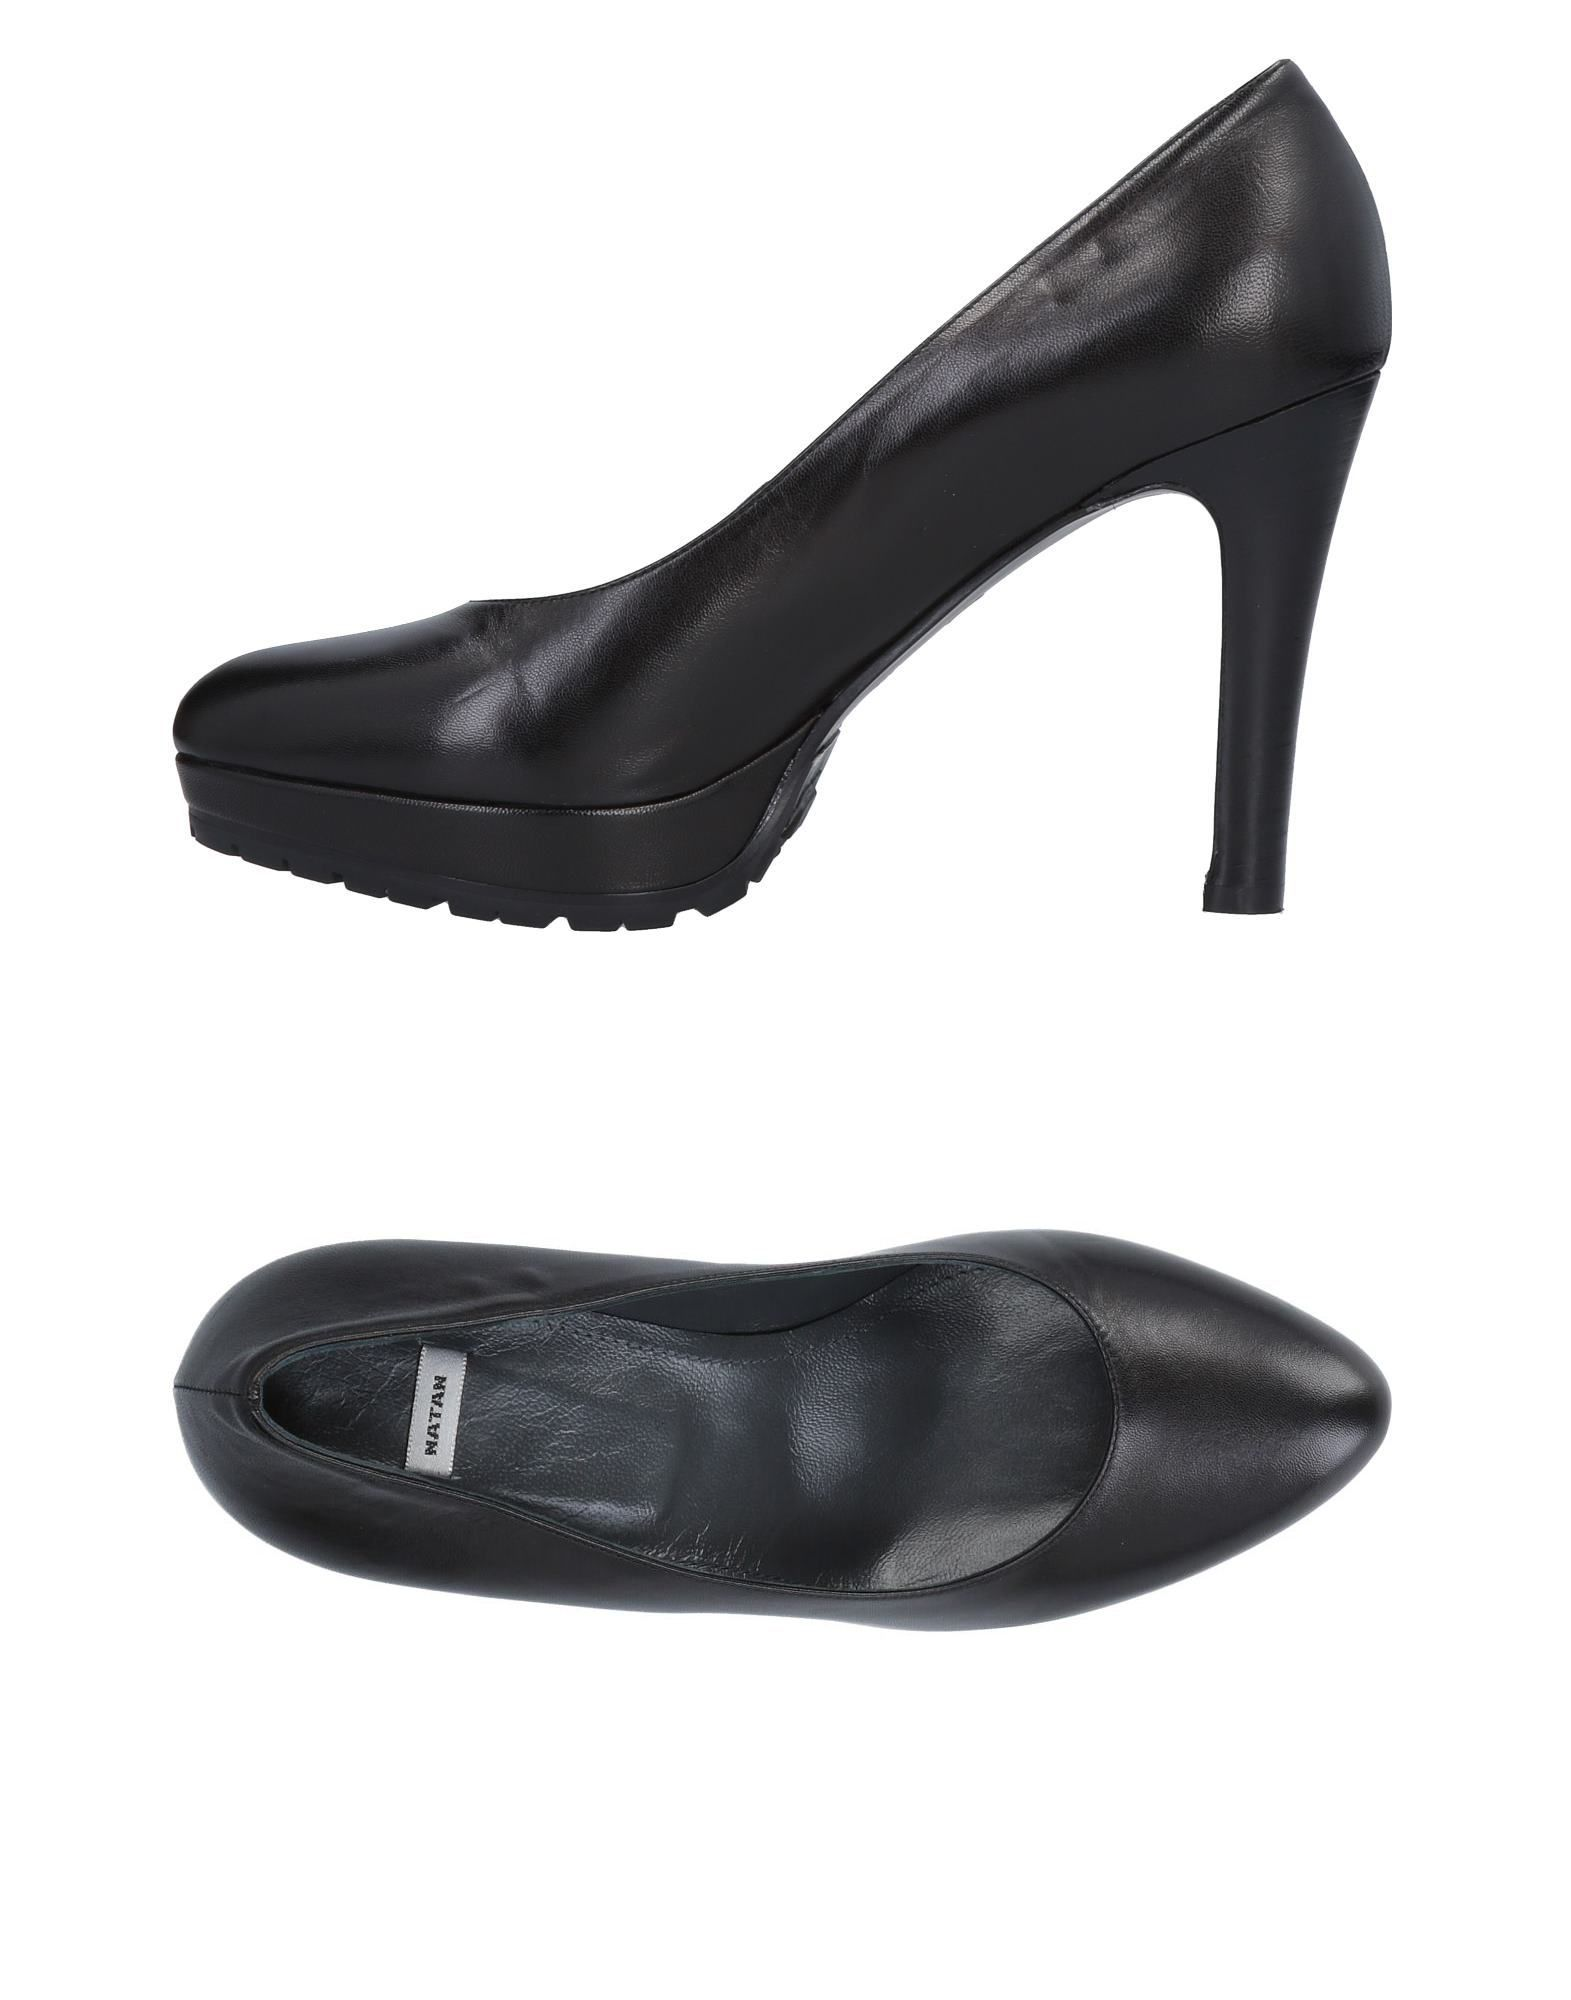 Stilvolle billige Schuhe Damen Natan Pumps Damen Schuhe  11474414KK 485762